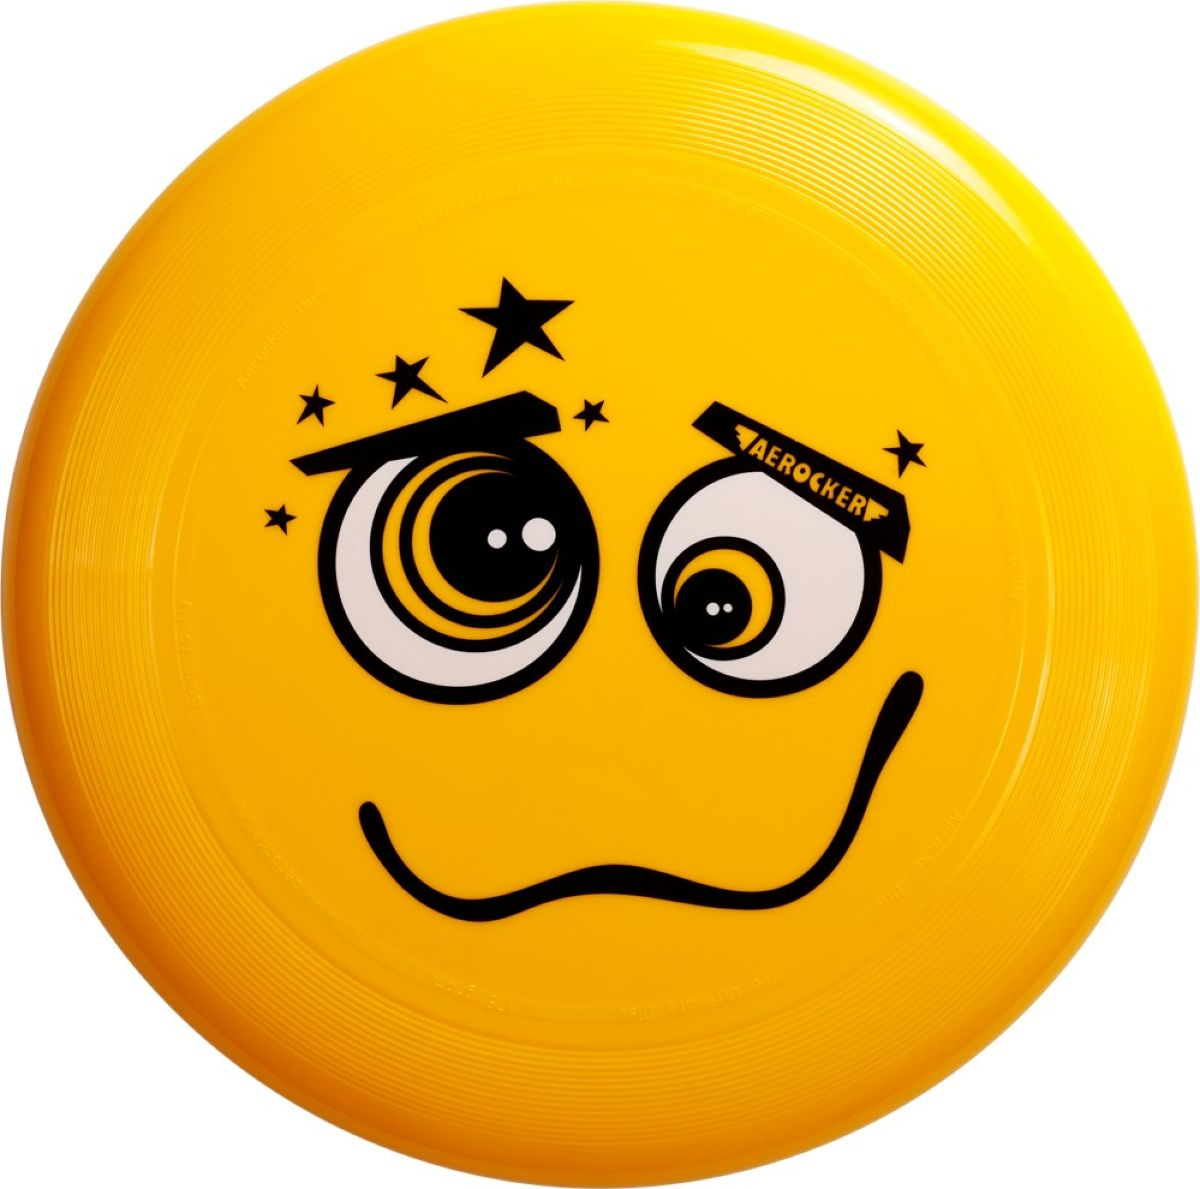 Aerocker Летающая тарелка Смайл цвет желтый